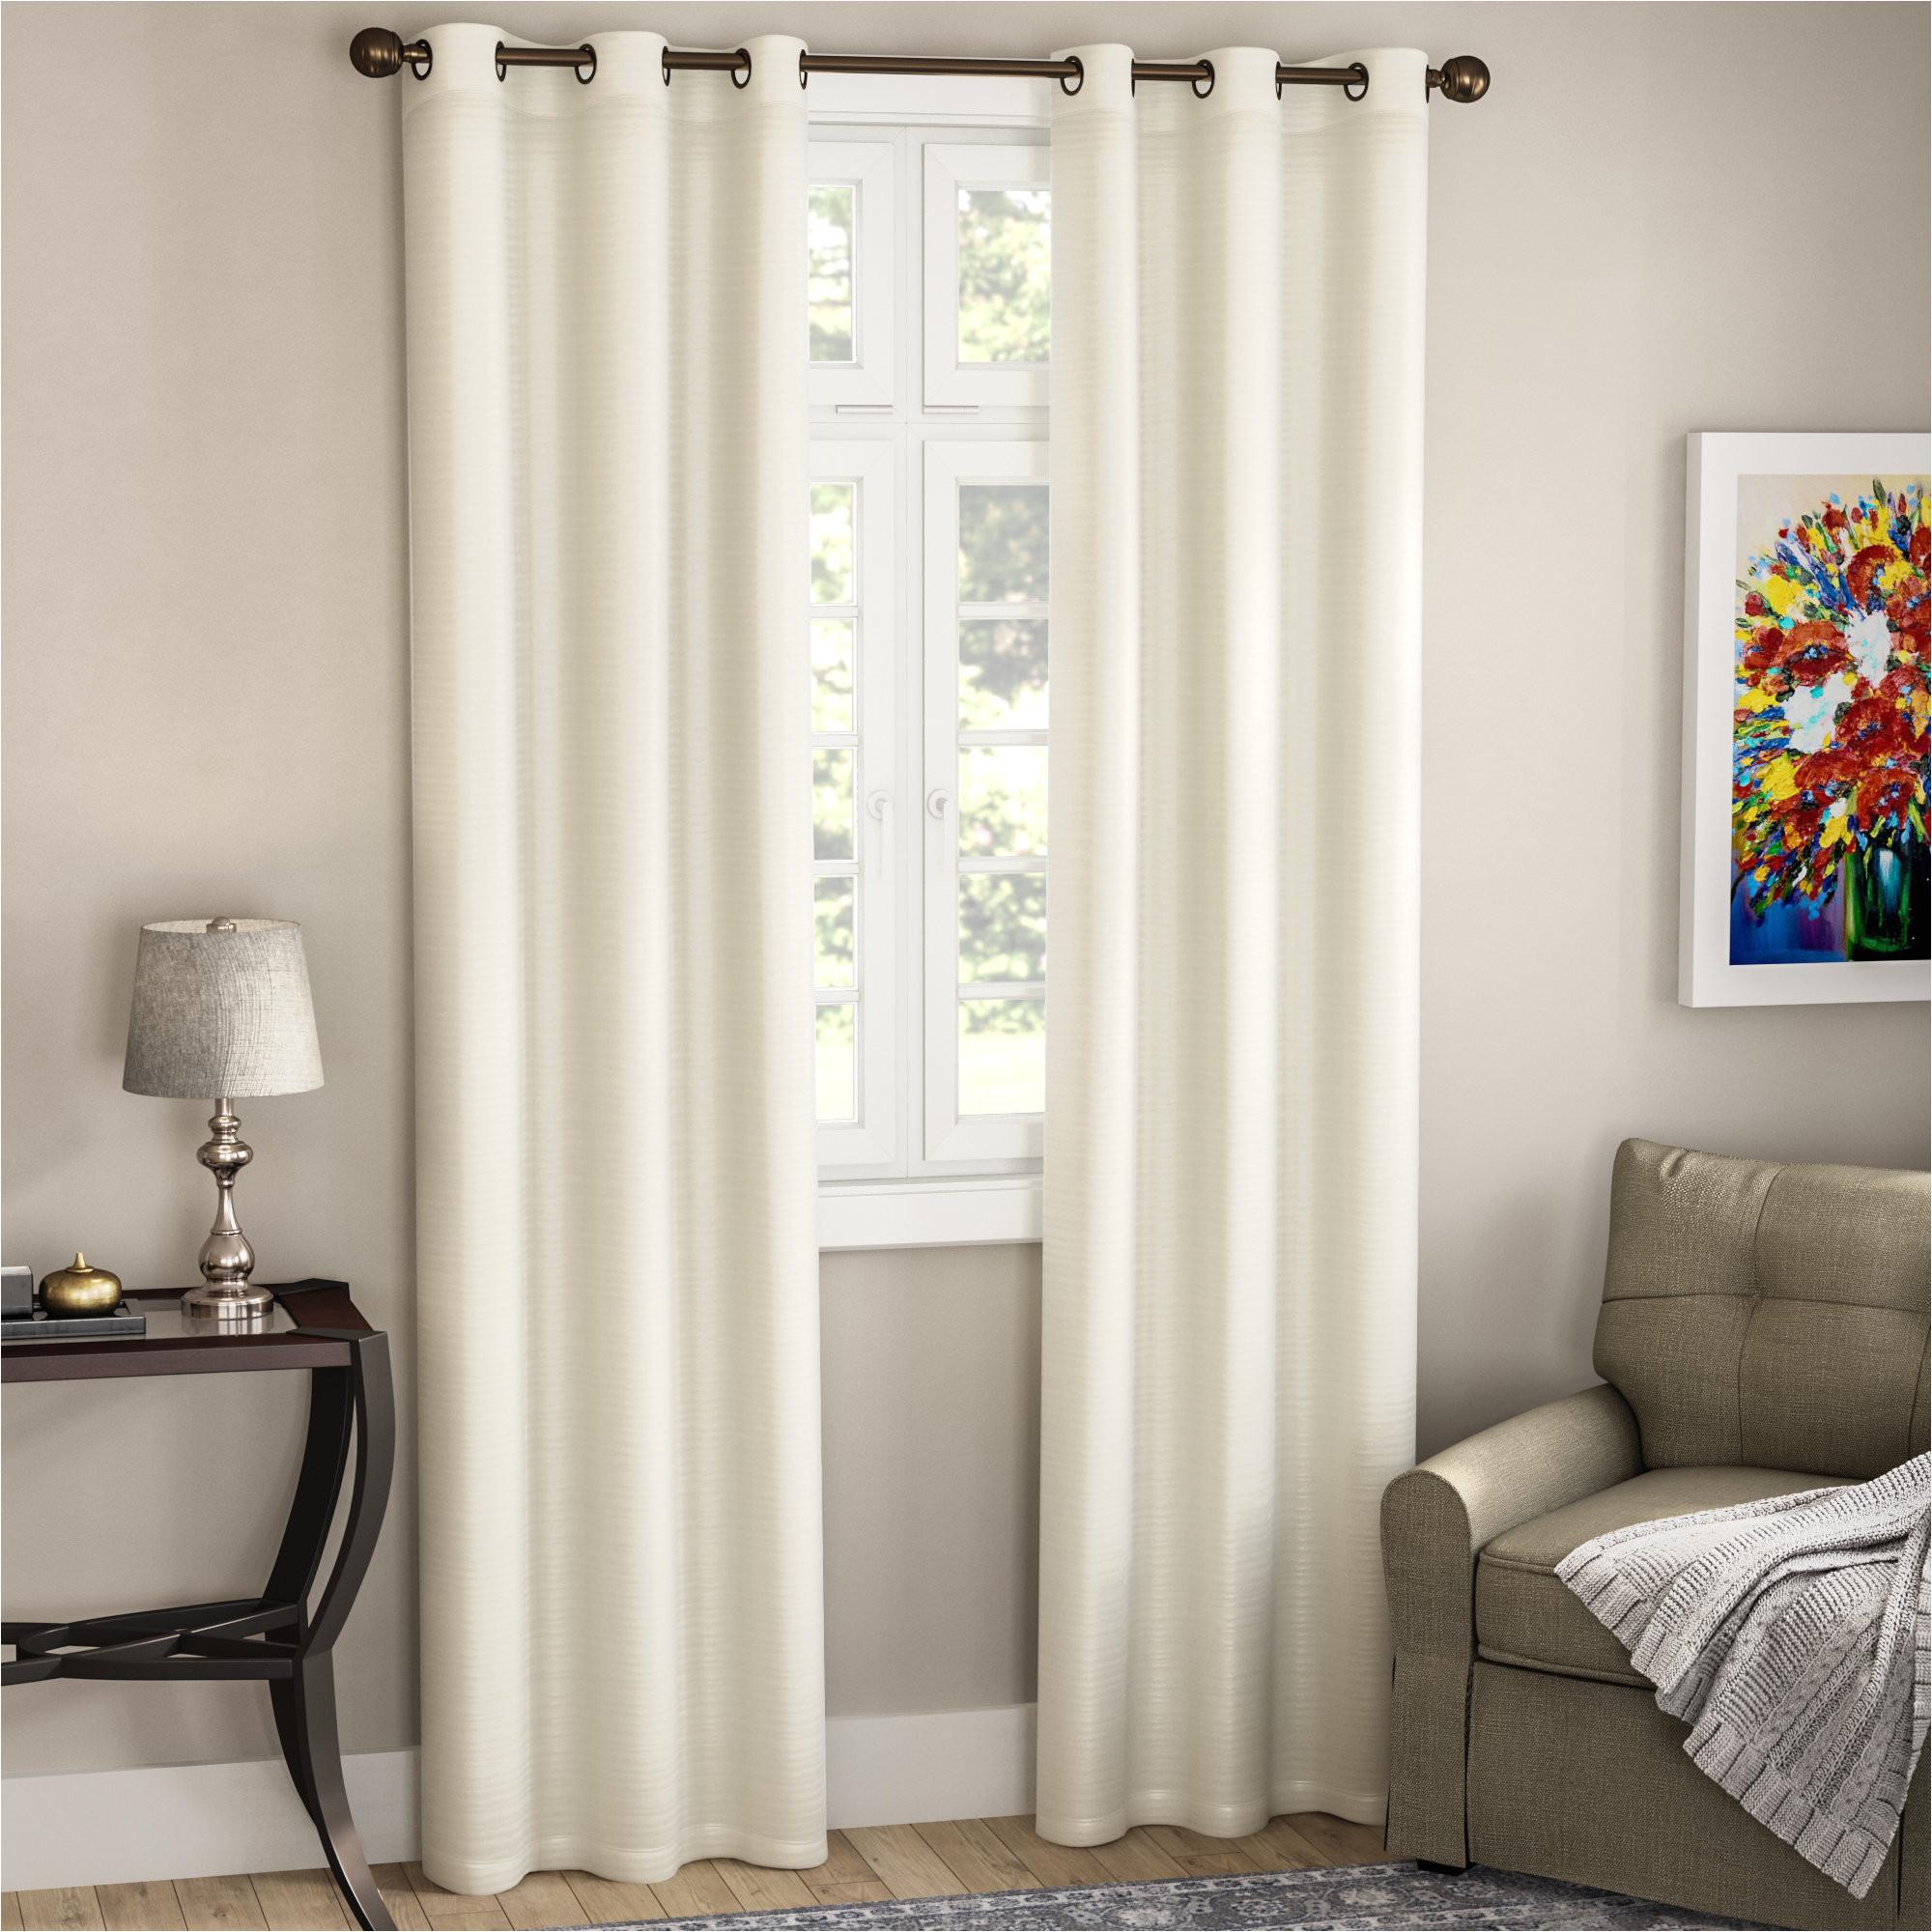 alcott hill edison solid room darkening grommet curtain panels reviews wayfair